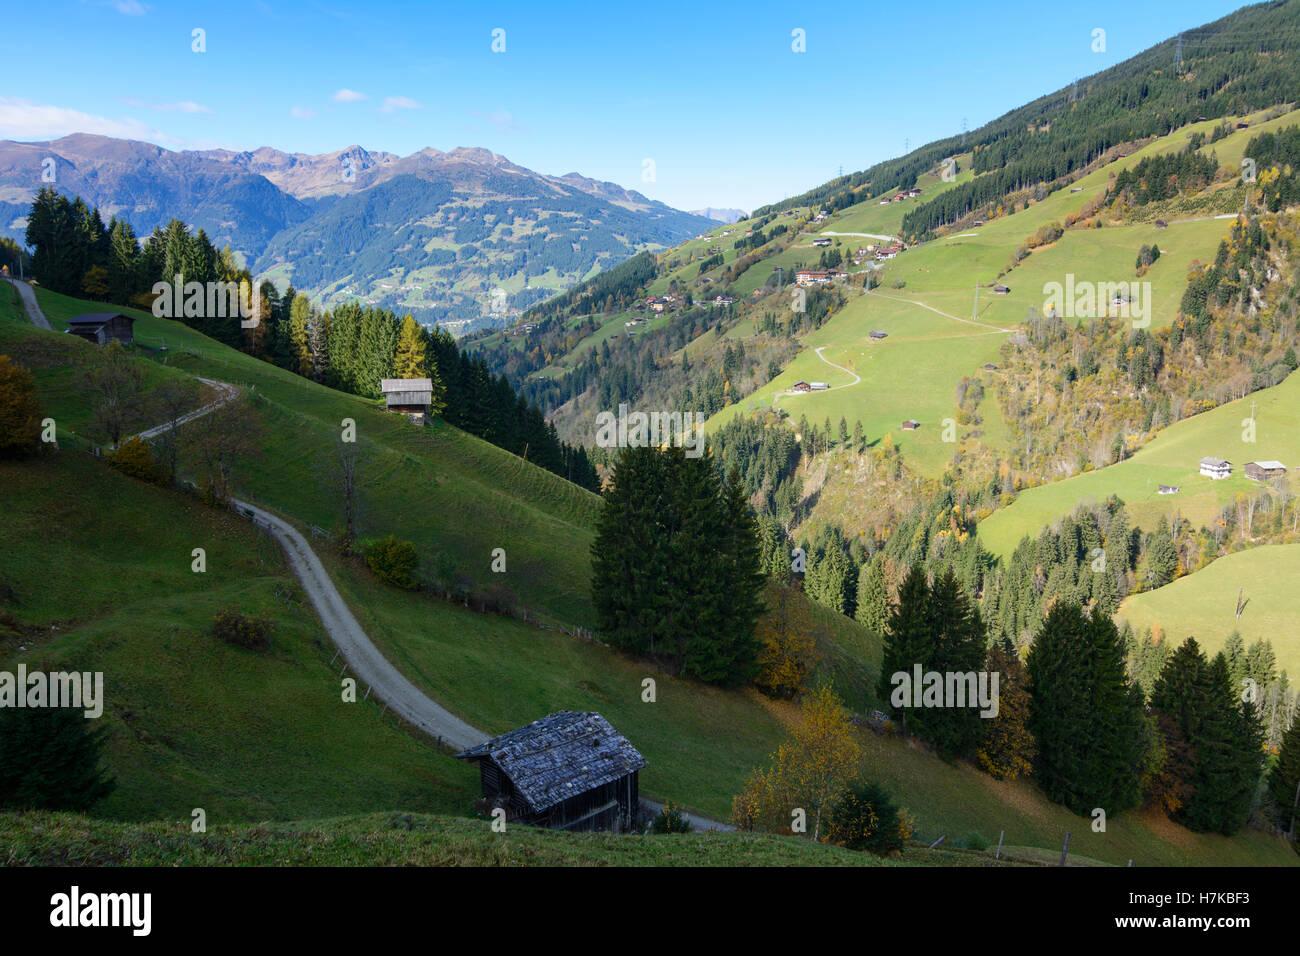 Hainzenberg: Gerlosbach valley, alp alpine pasture, Zillertaler Alpen, barns, Zell-Gerlos, Tirol, Tyrol, Austria - Stock Image